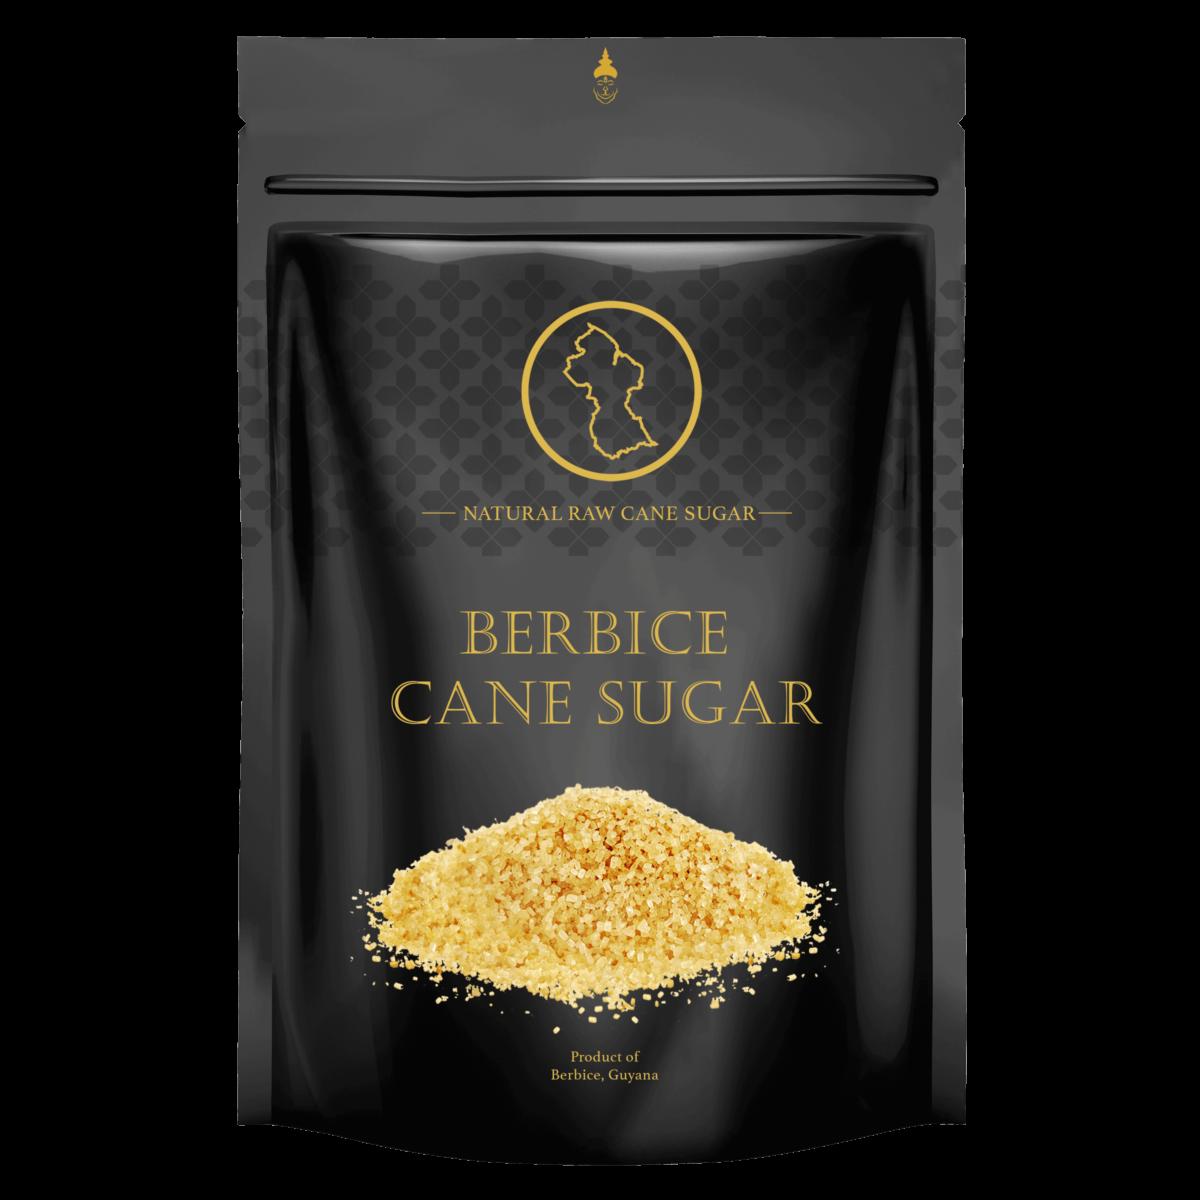 Berbice Cane Sugar